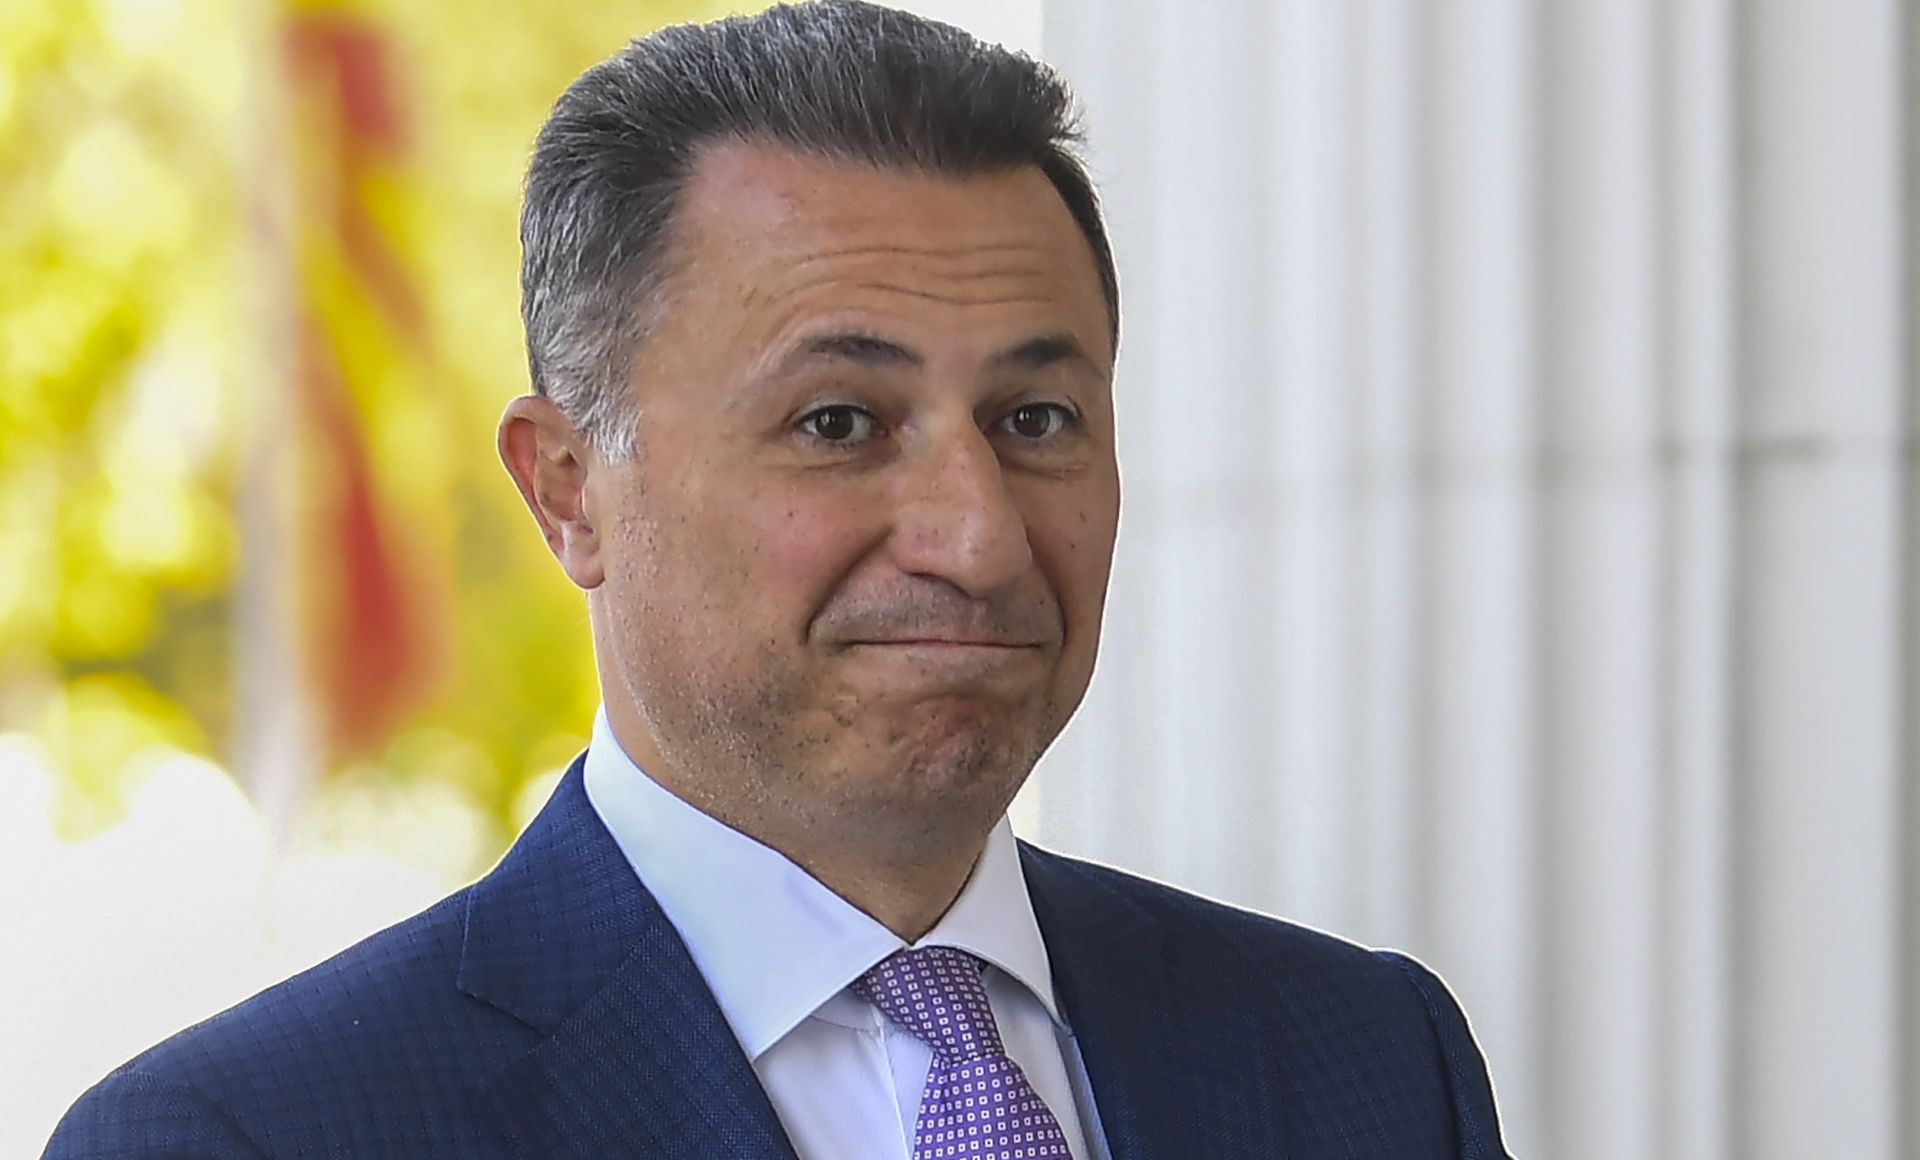 Bivšem makedonskom premijeru odobren azil u Mađarskoj